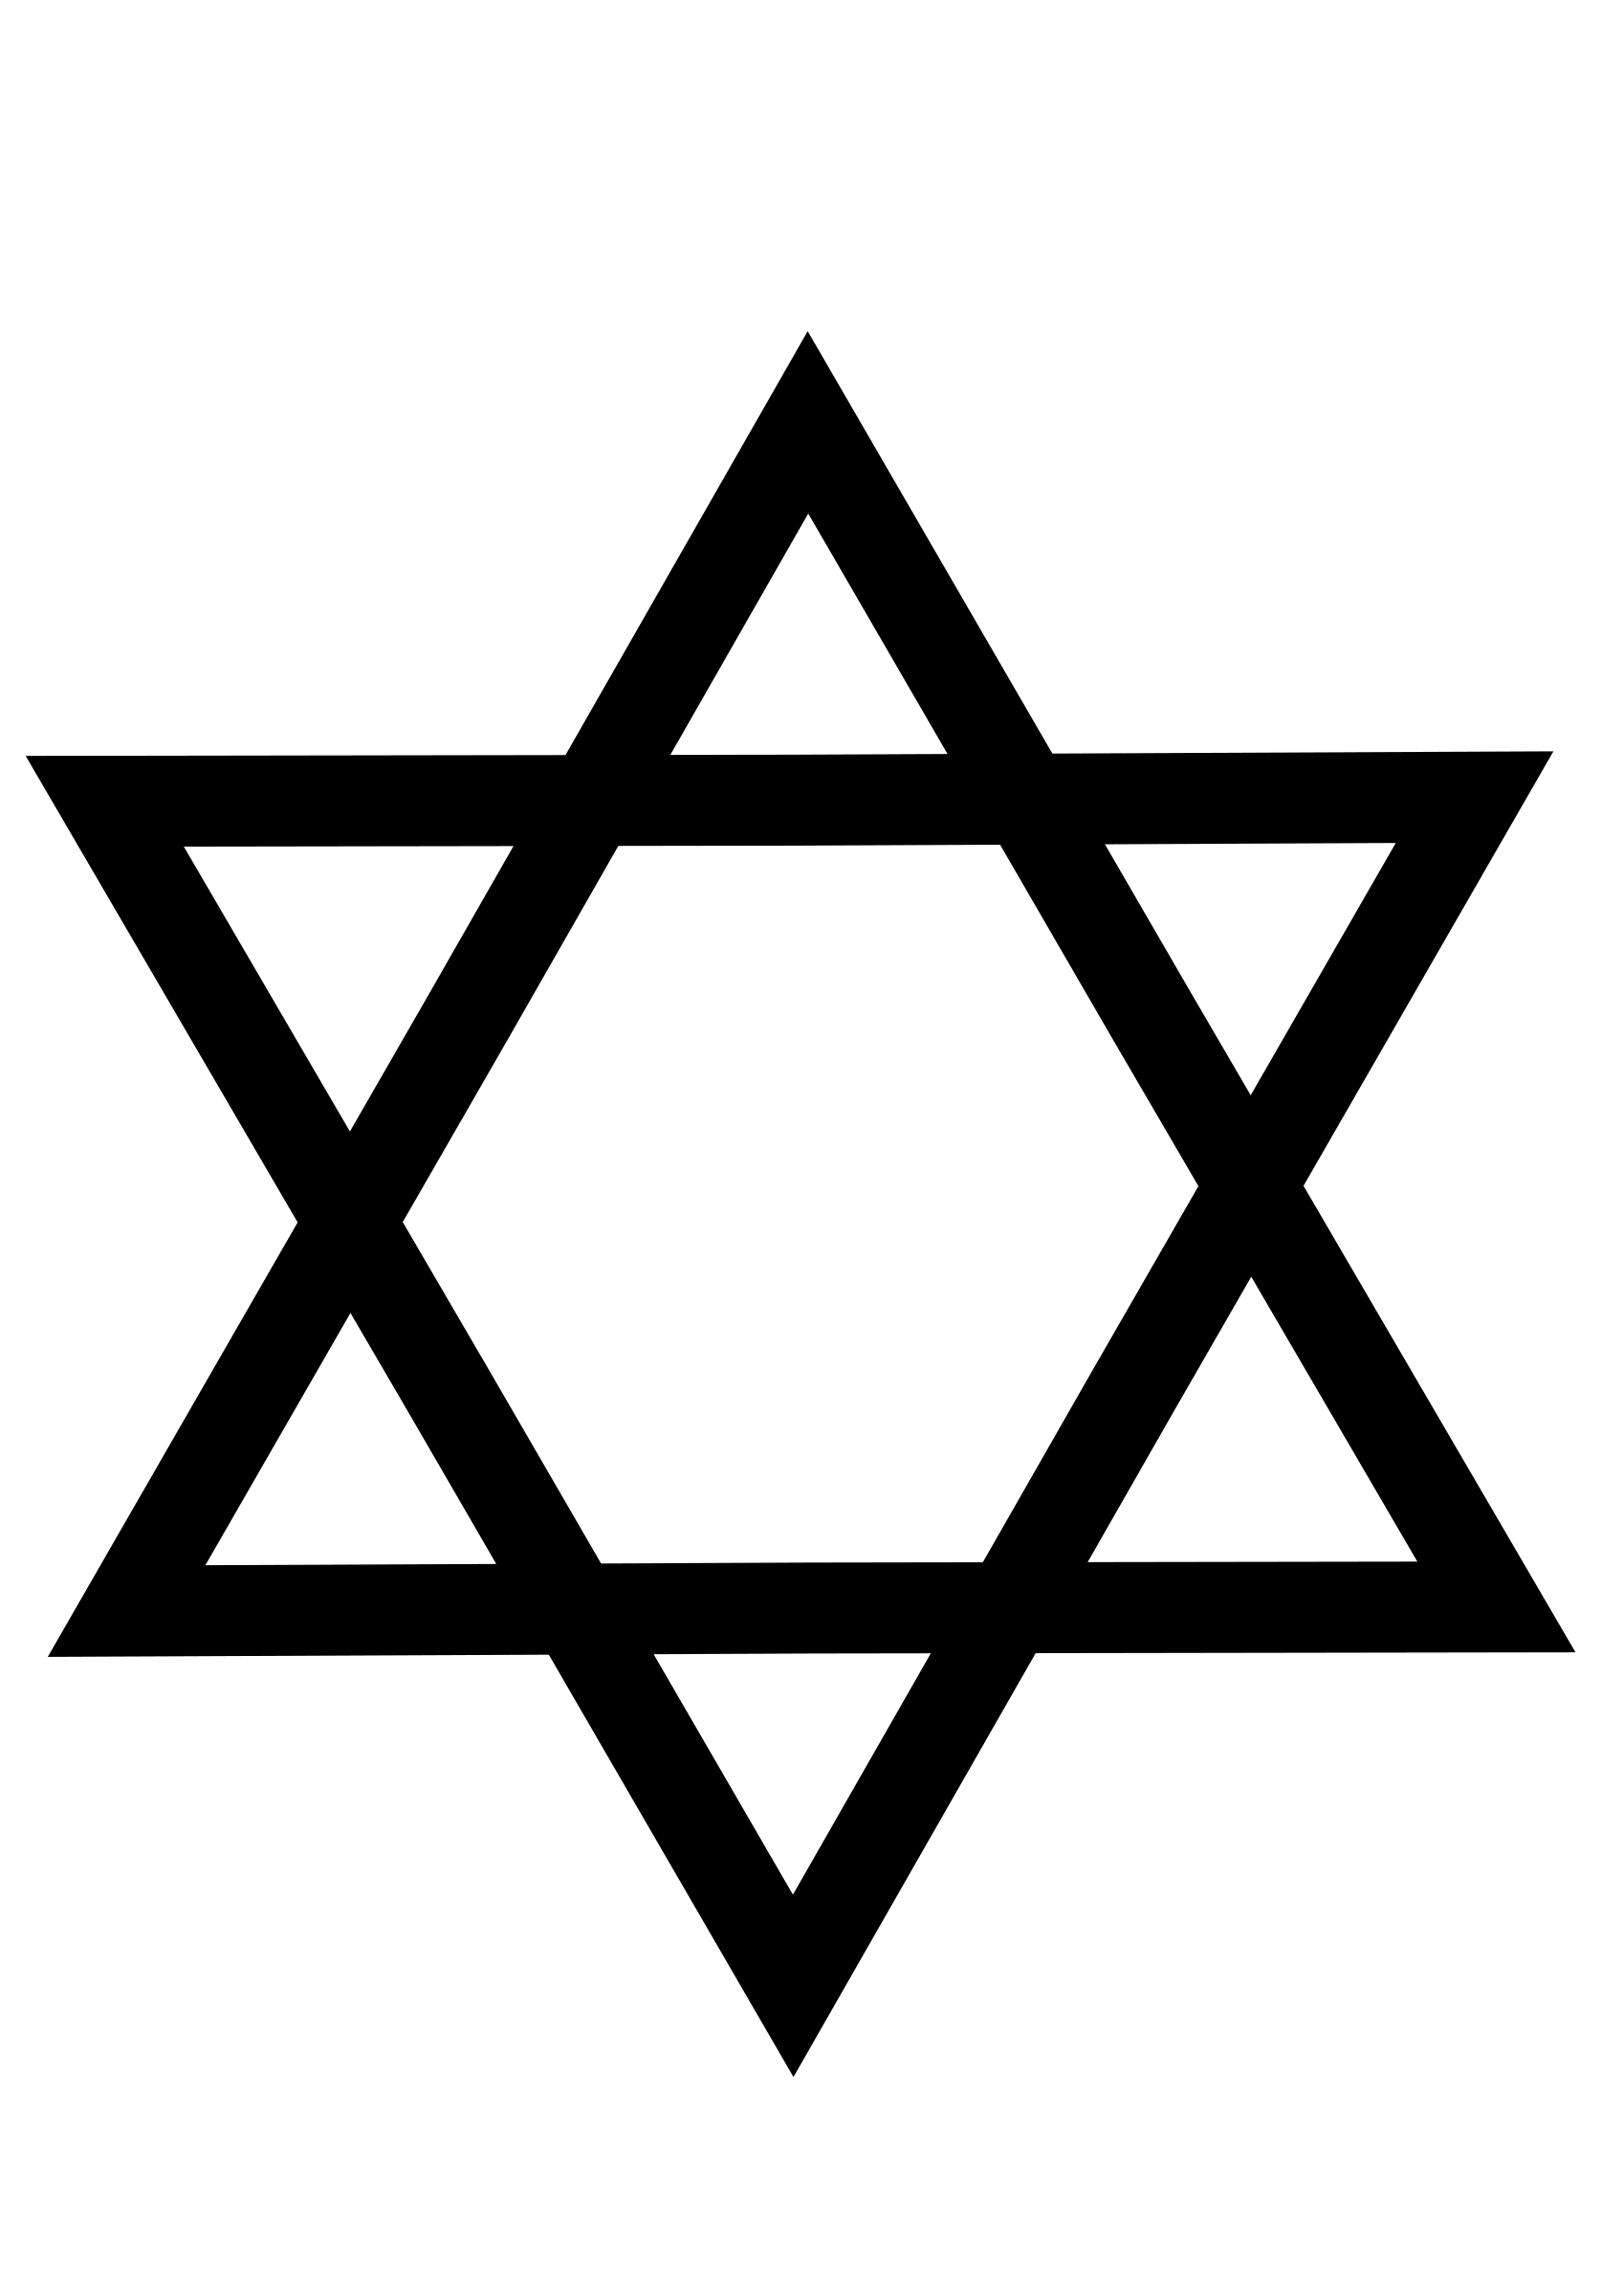 Star of david black and white clipart clipart library download Clipart - Estrella de David clipart library download